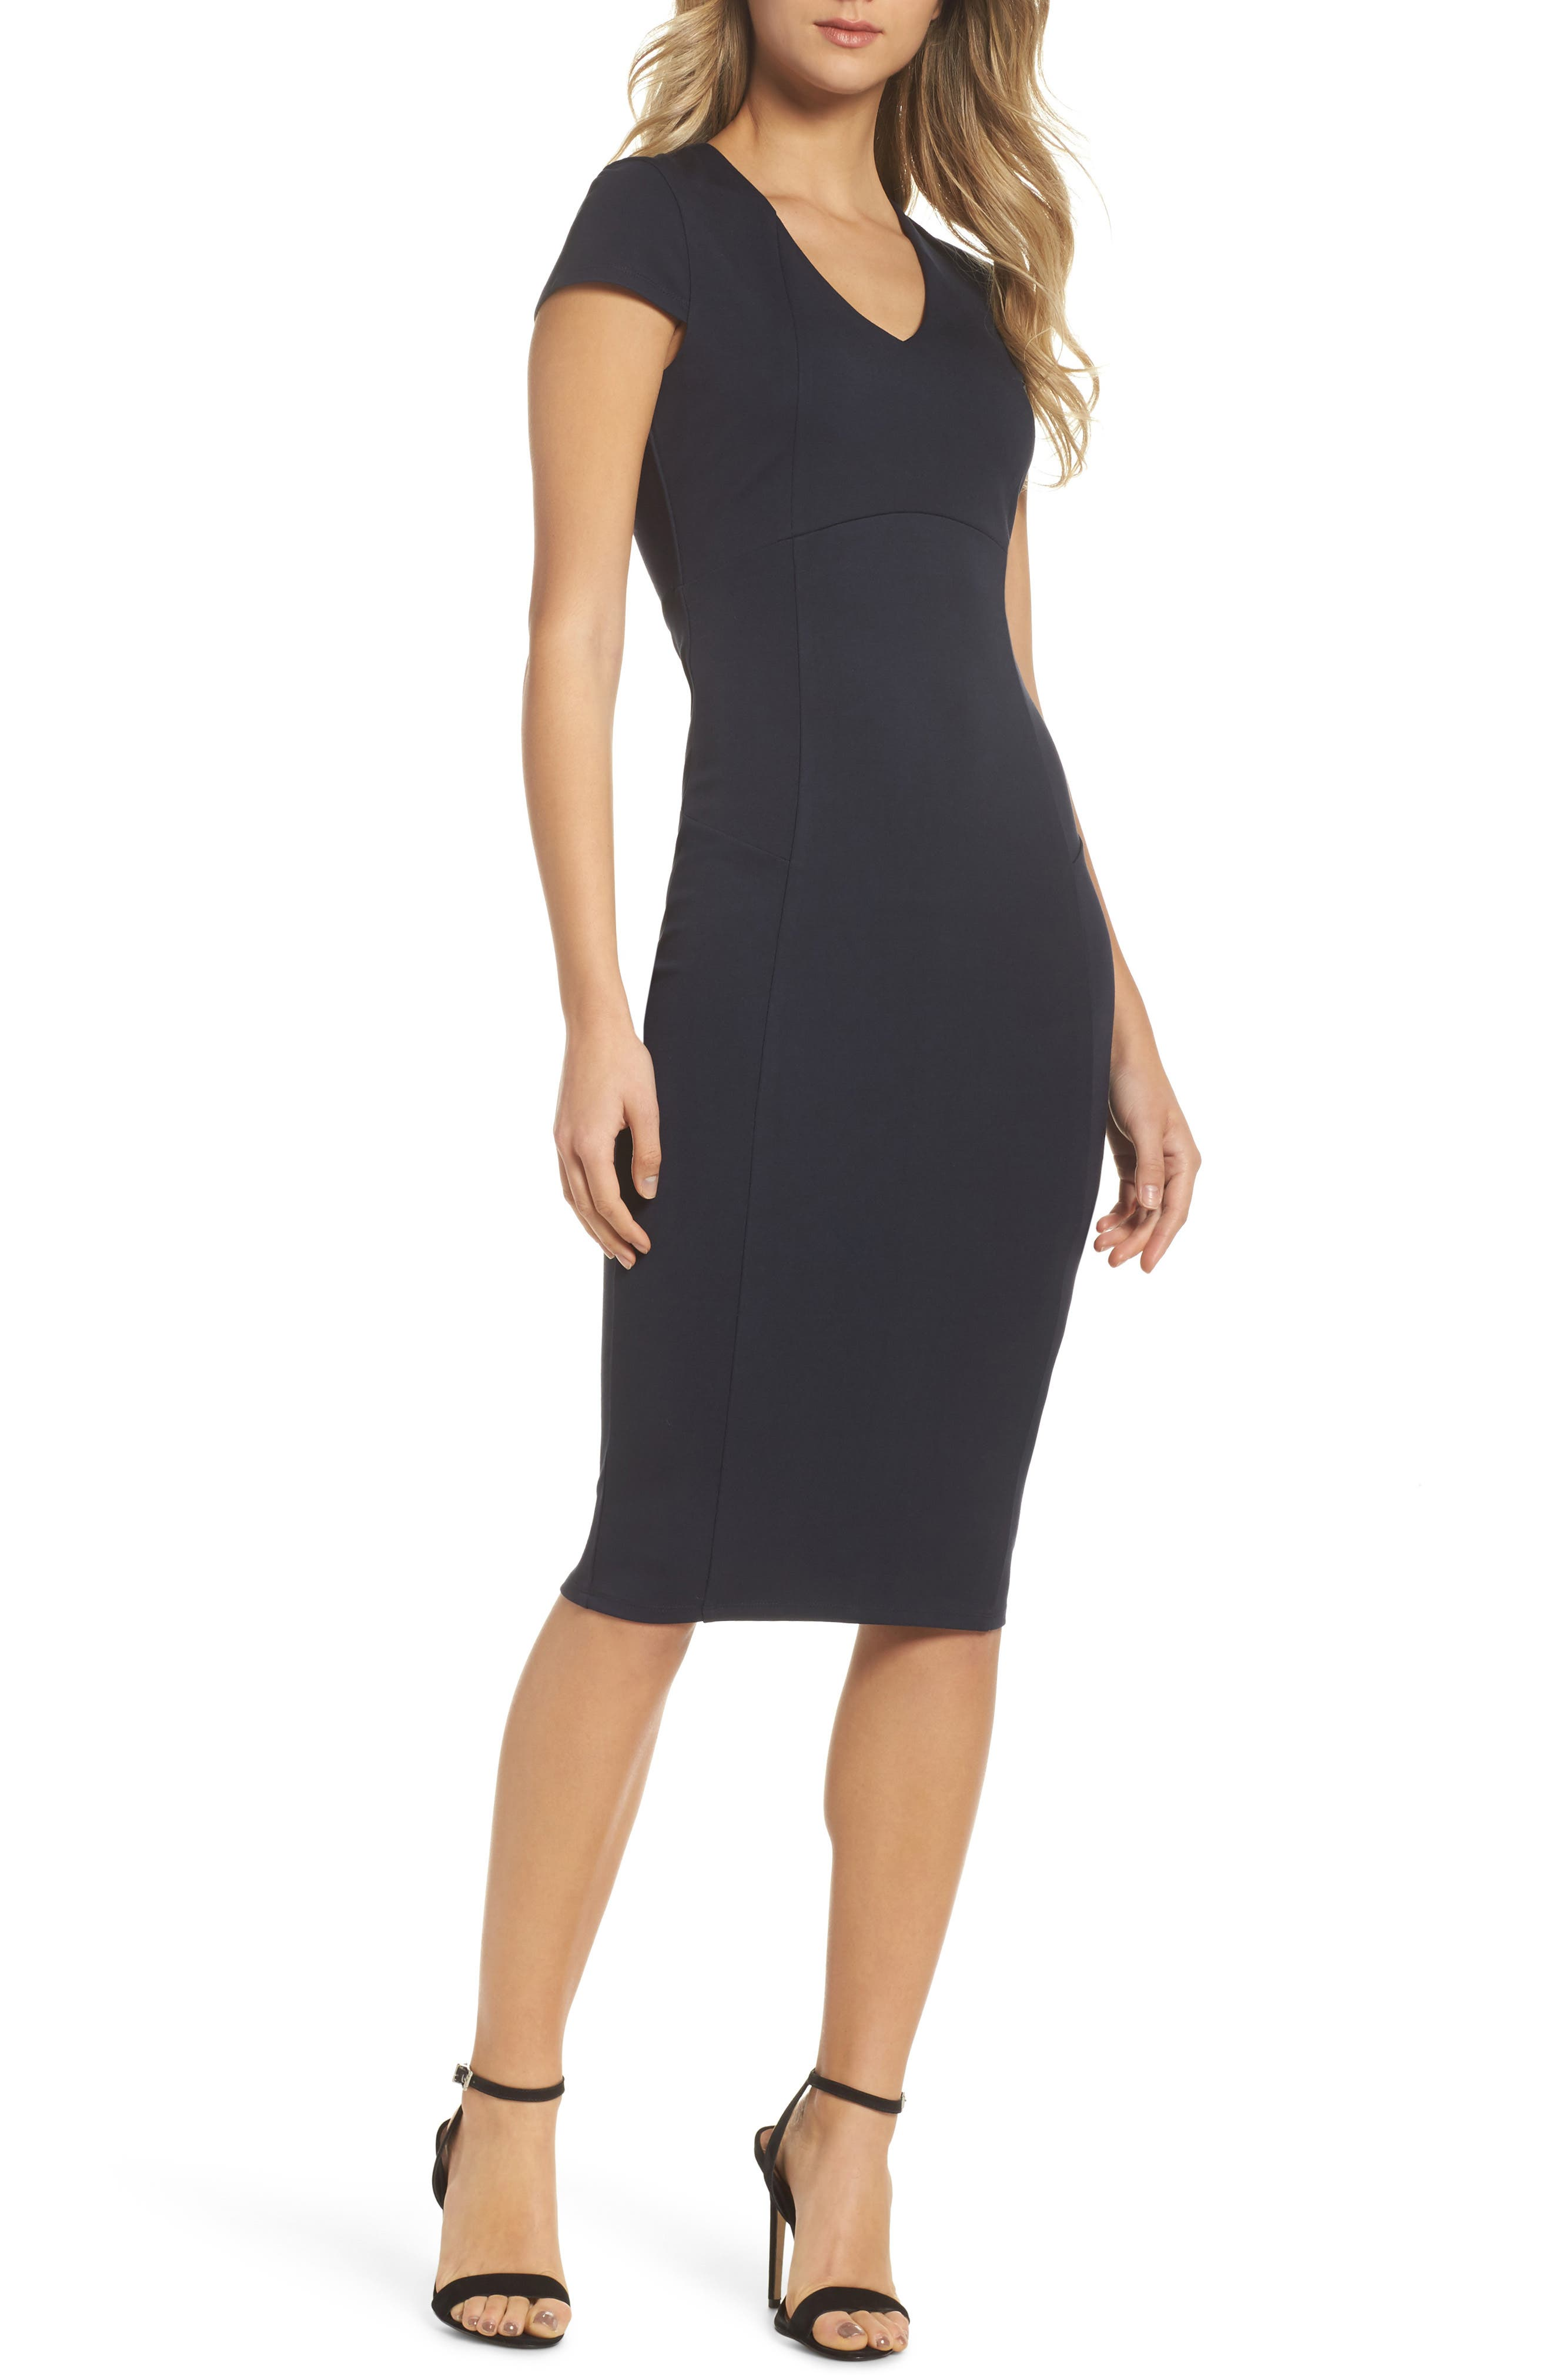 Main Image - Felicity & Coco Nikki Body-Con Dress (Nordstrom Exclusive)